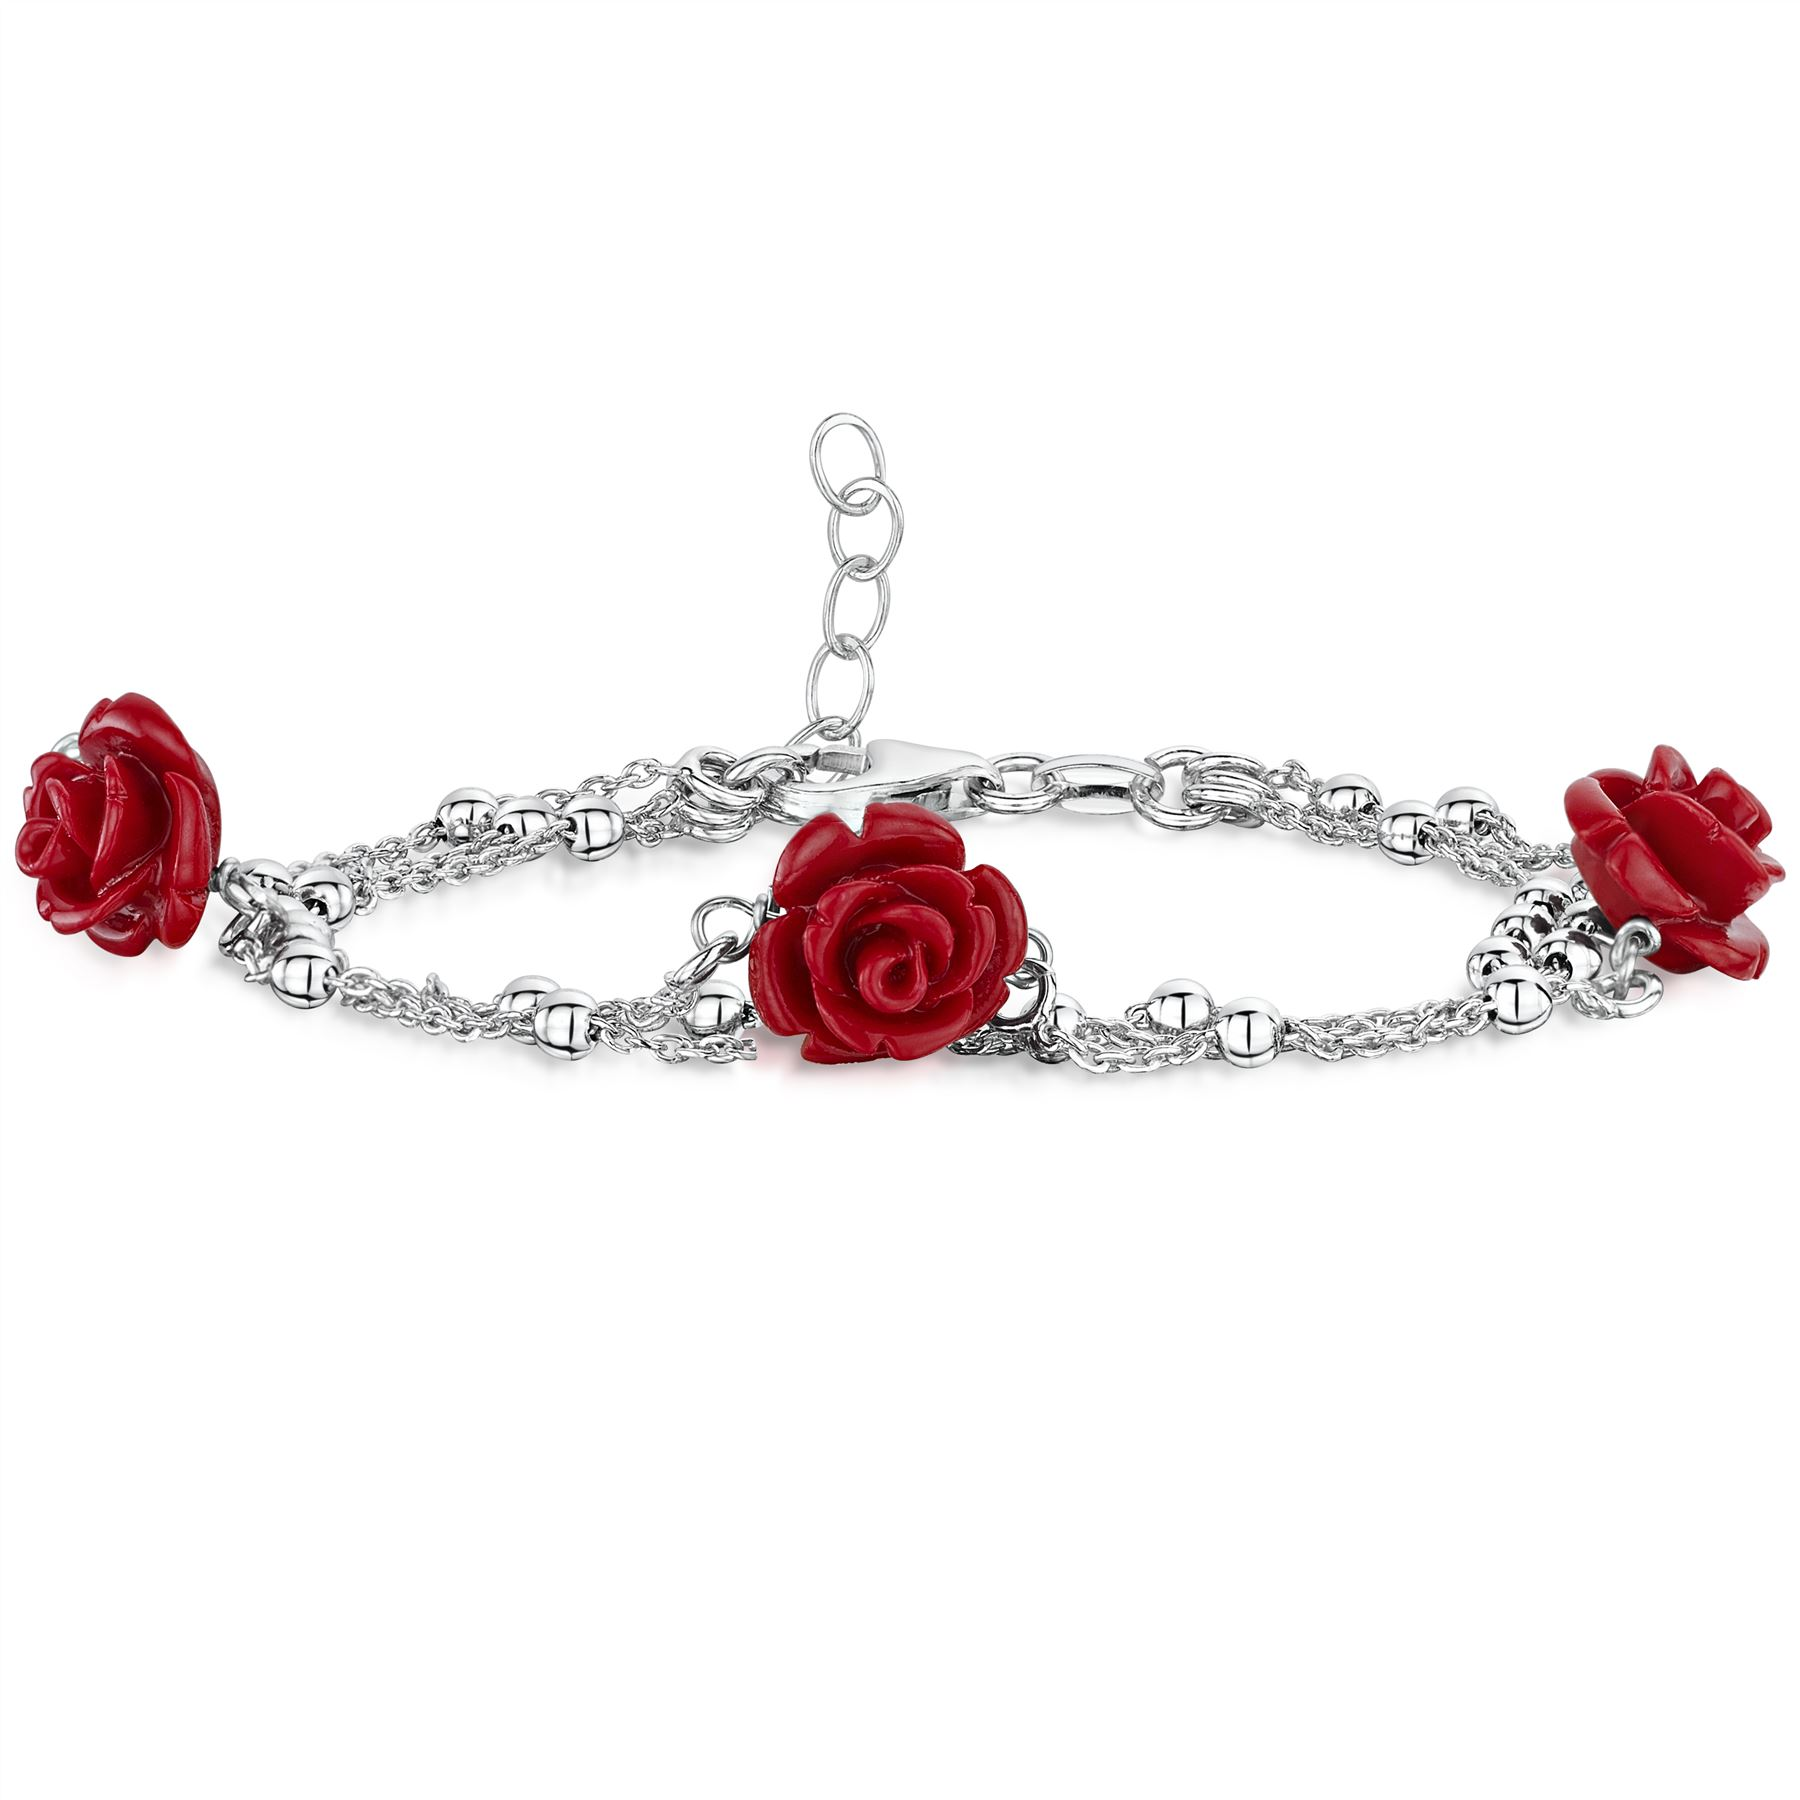 Amberta-Jewelry-925-Sterling-Silver-Adjustable-Bracelet-Italian-Bangle-for-Women miniature 24